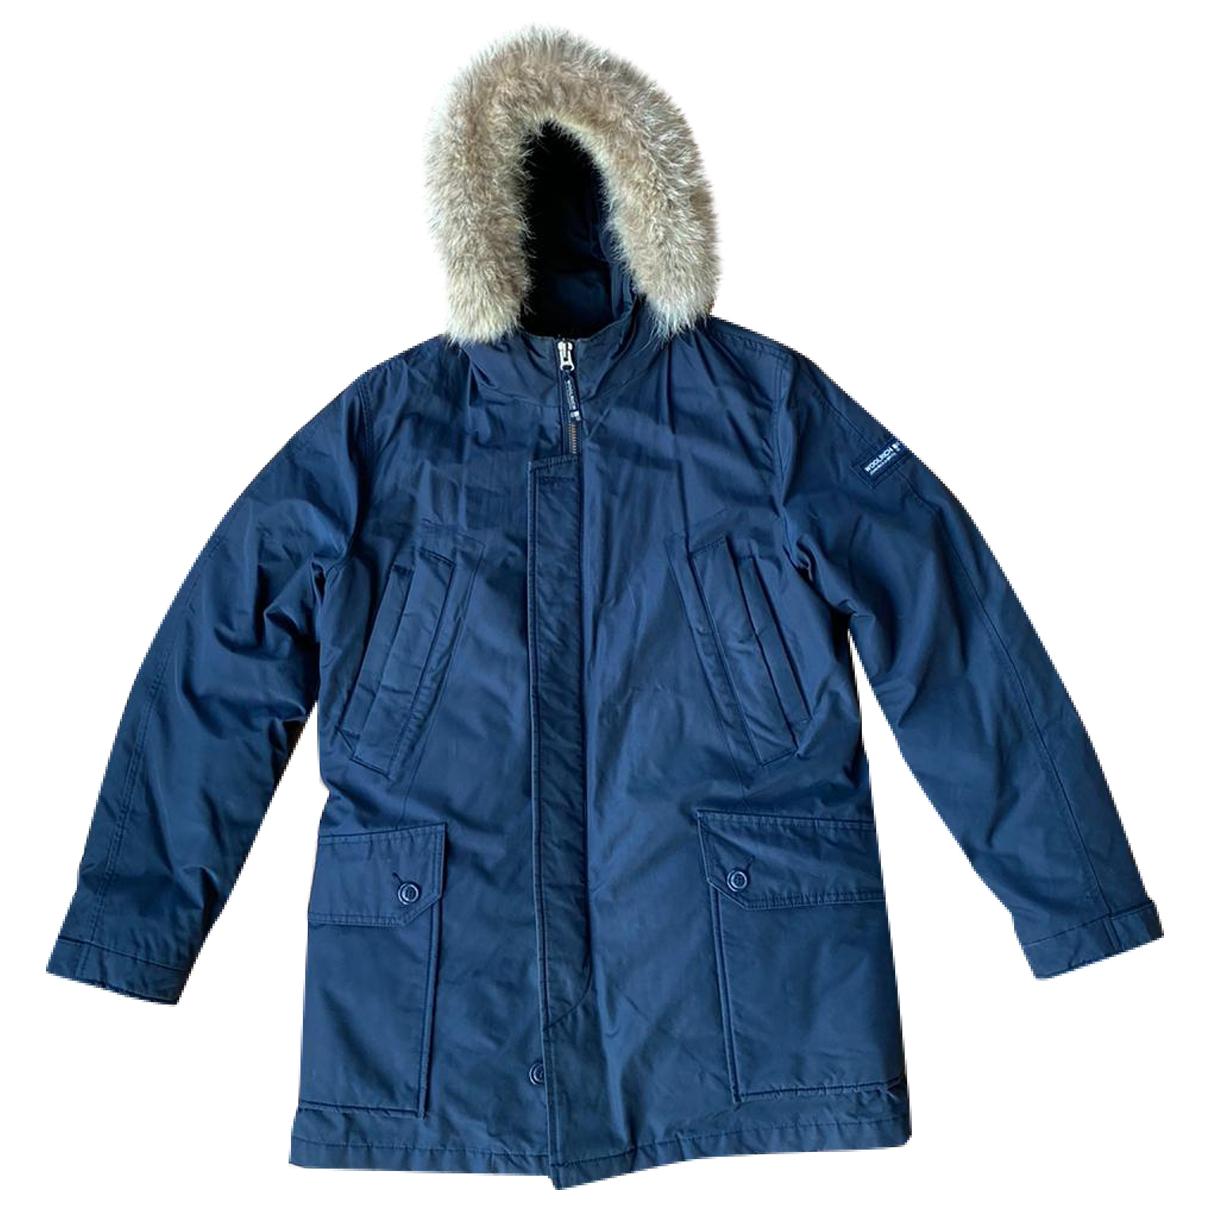 Woolrich \N Blue jacket  for Men M International